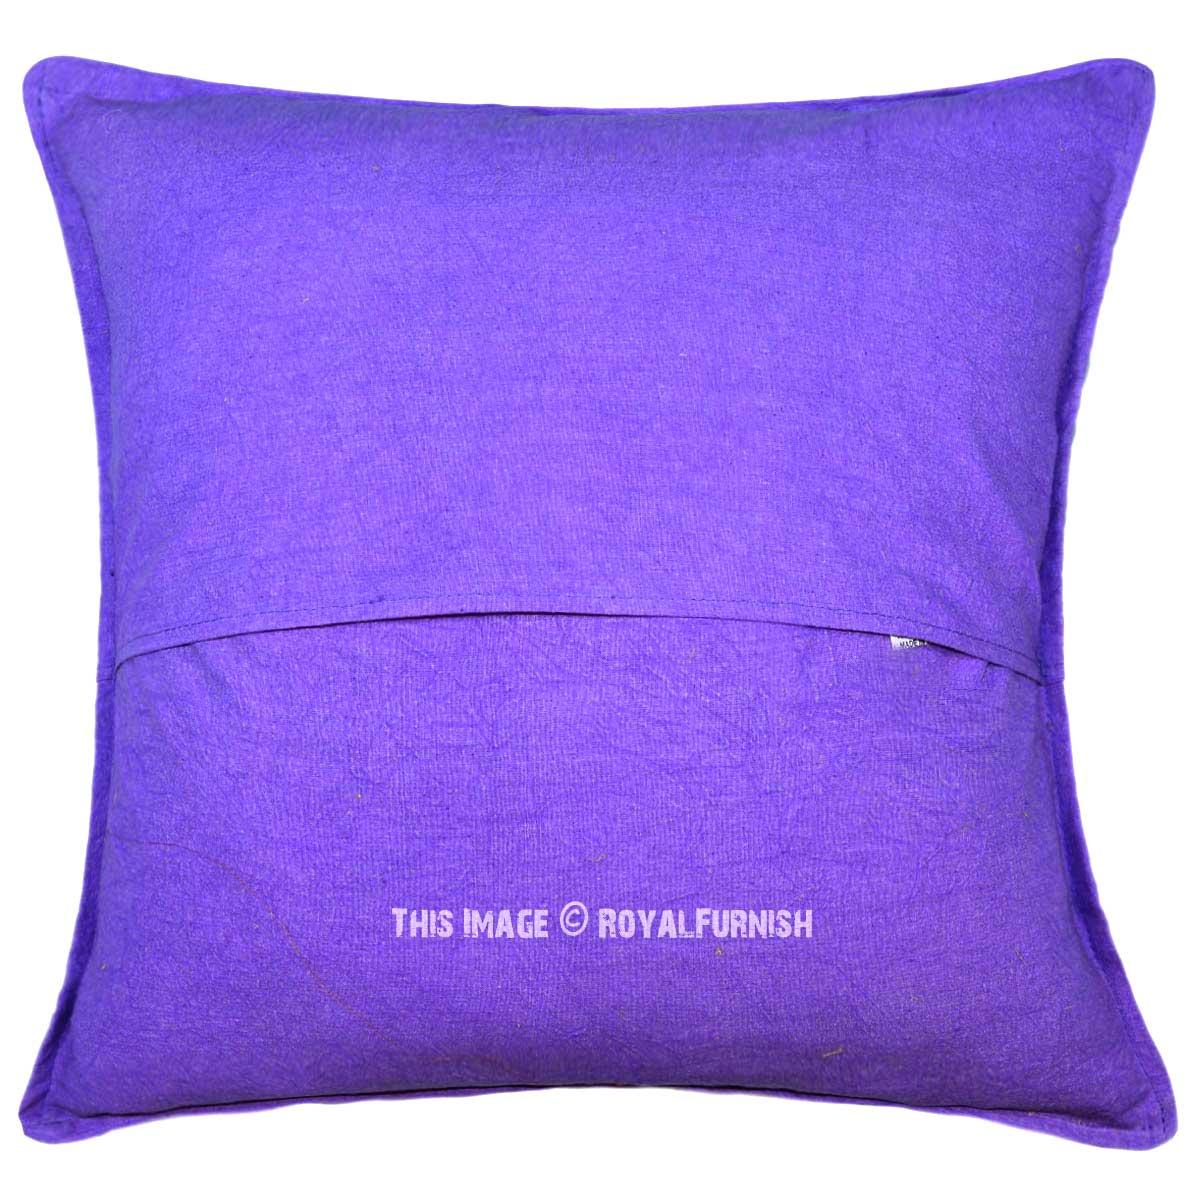 16X16 Purple Peacock Dance Theme Needlepoint Cotton Throw Pillow Cover - RoyalFurnish.com